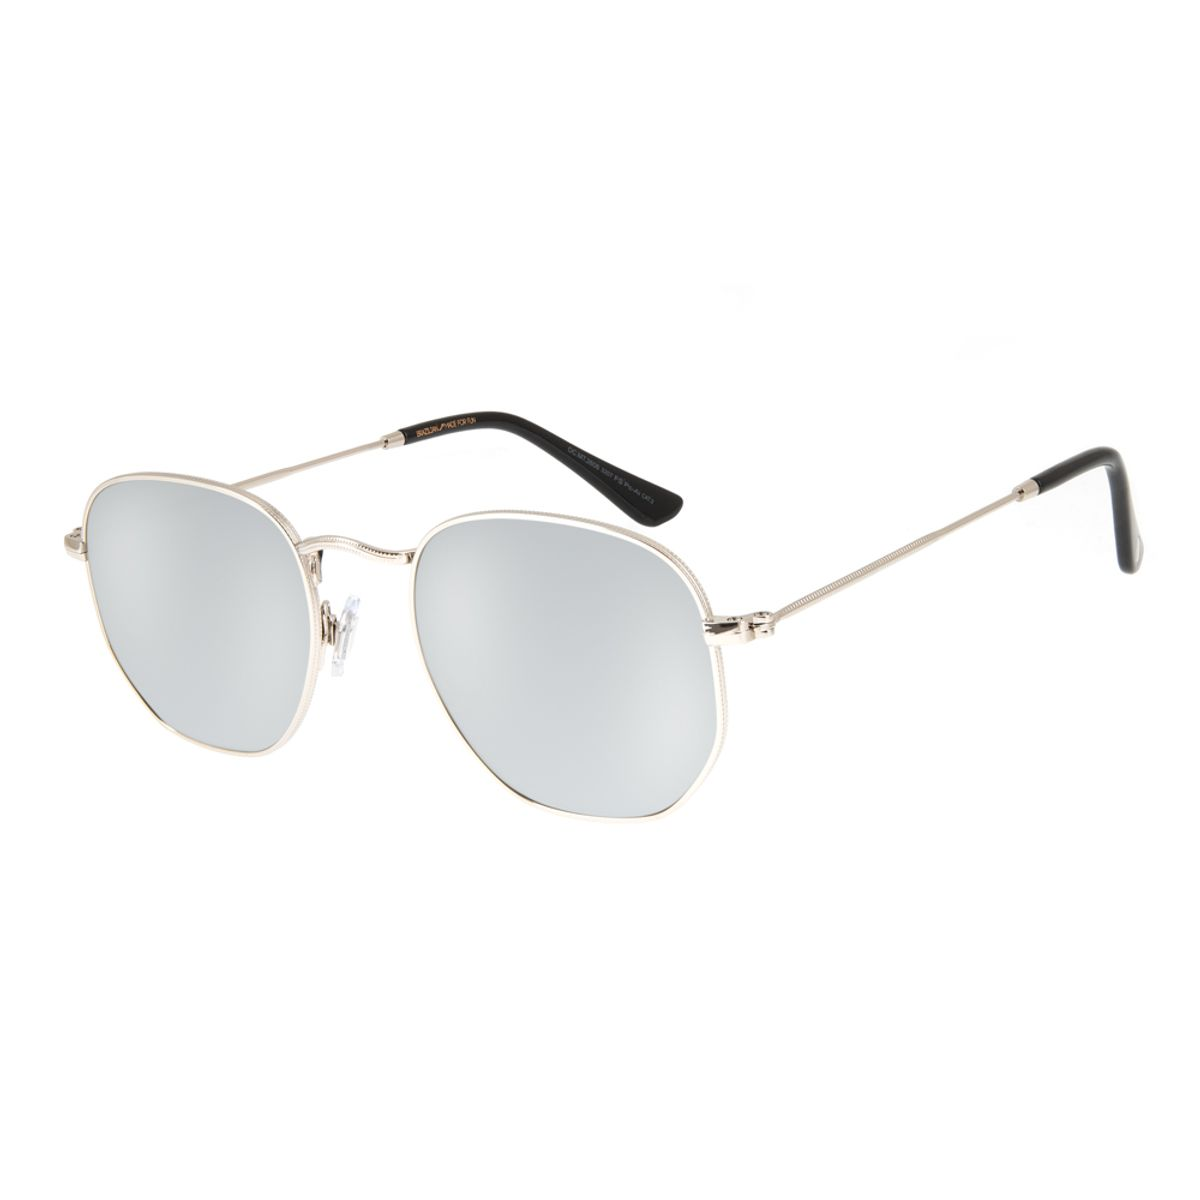 7aa3f3497 Óculos de Sol Chilli Beans Unissex Metal Redondo Prata 2606 - Chilli ...